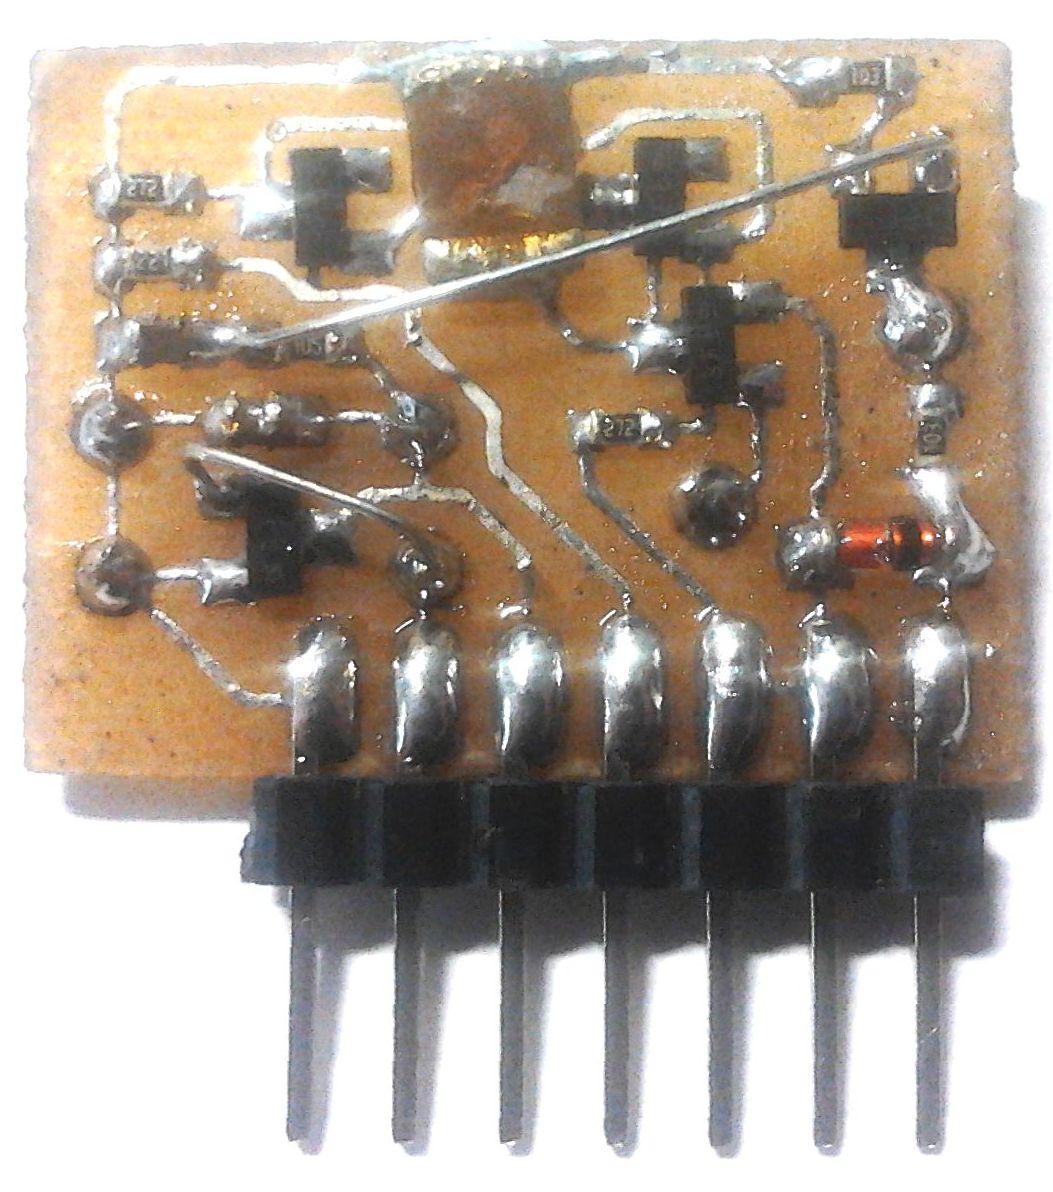 двигатель фролова схема